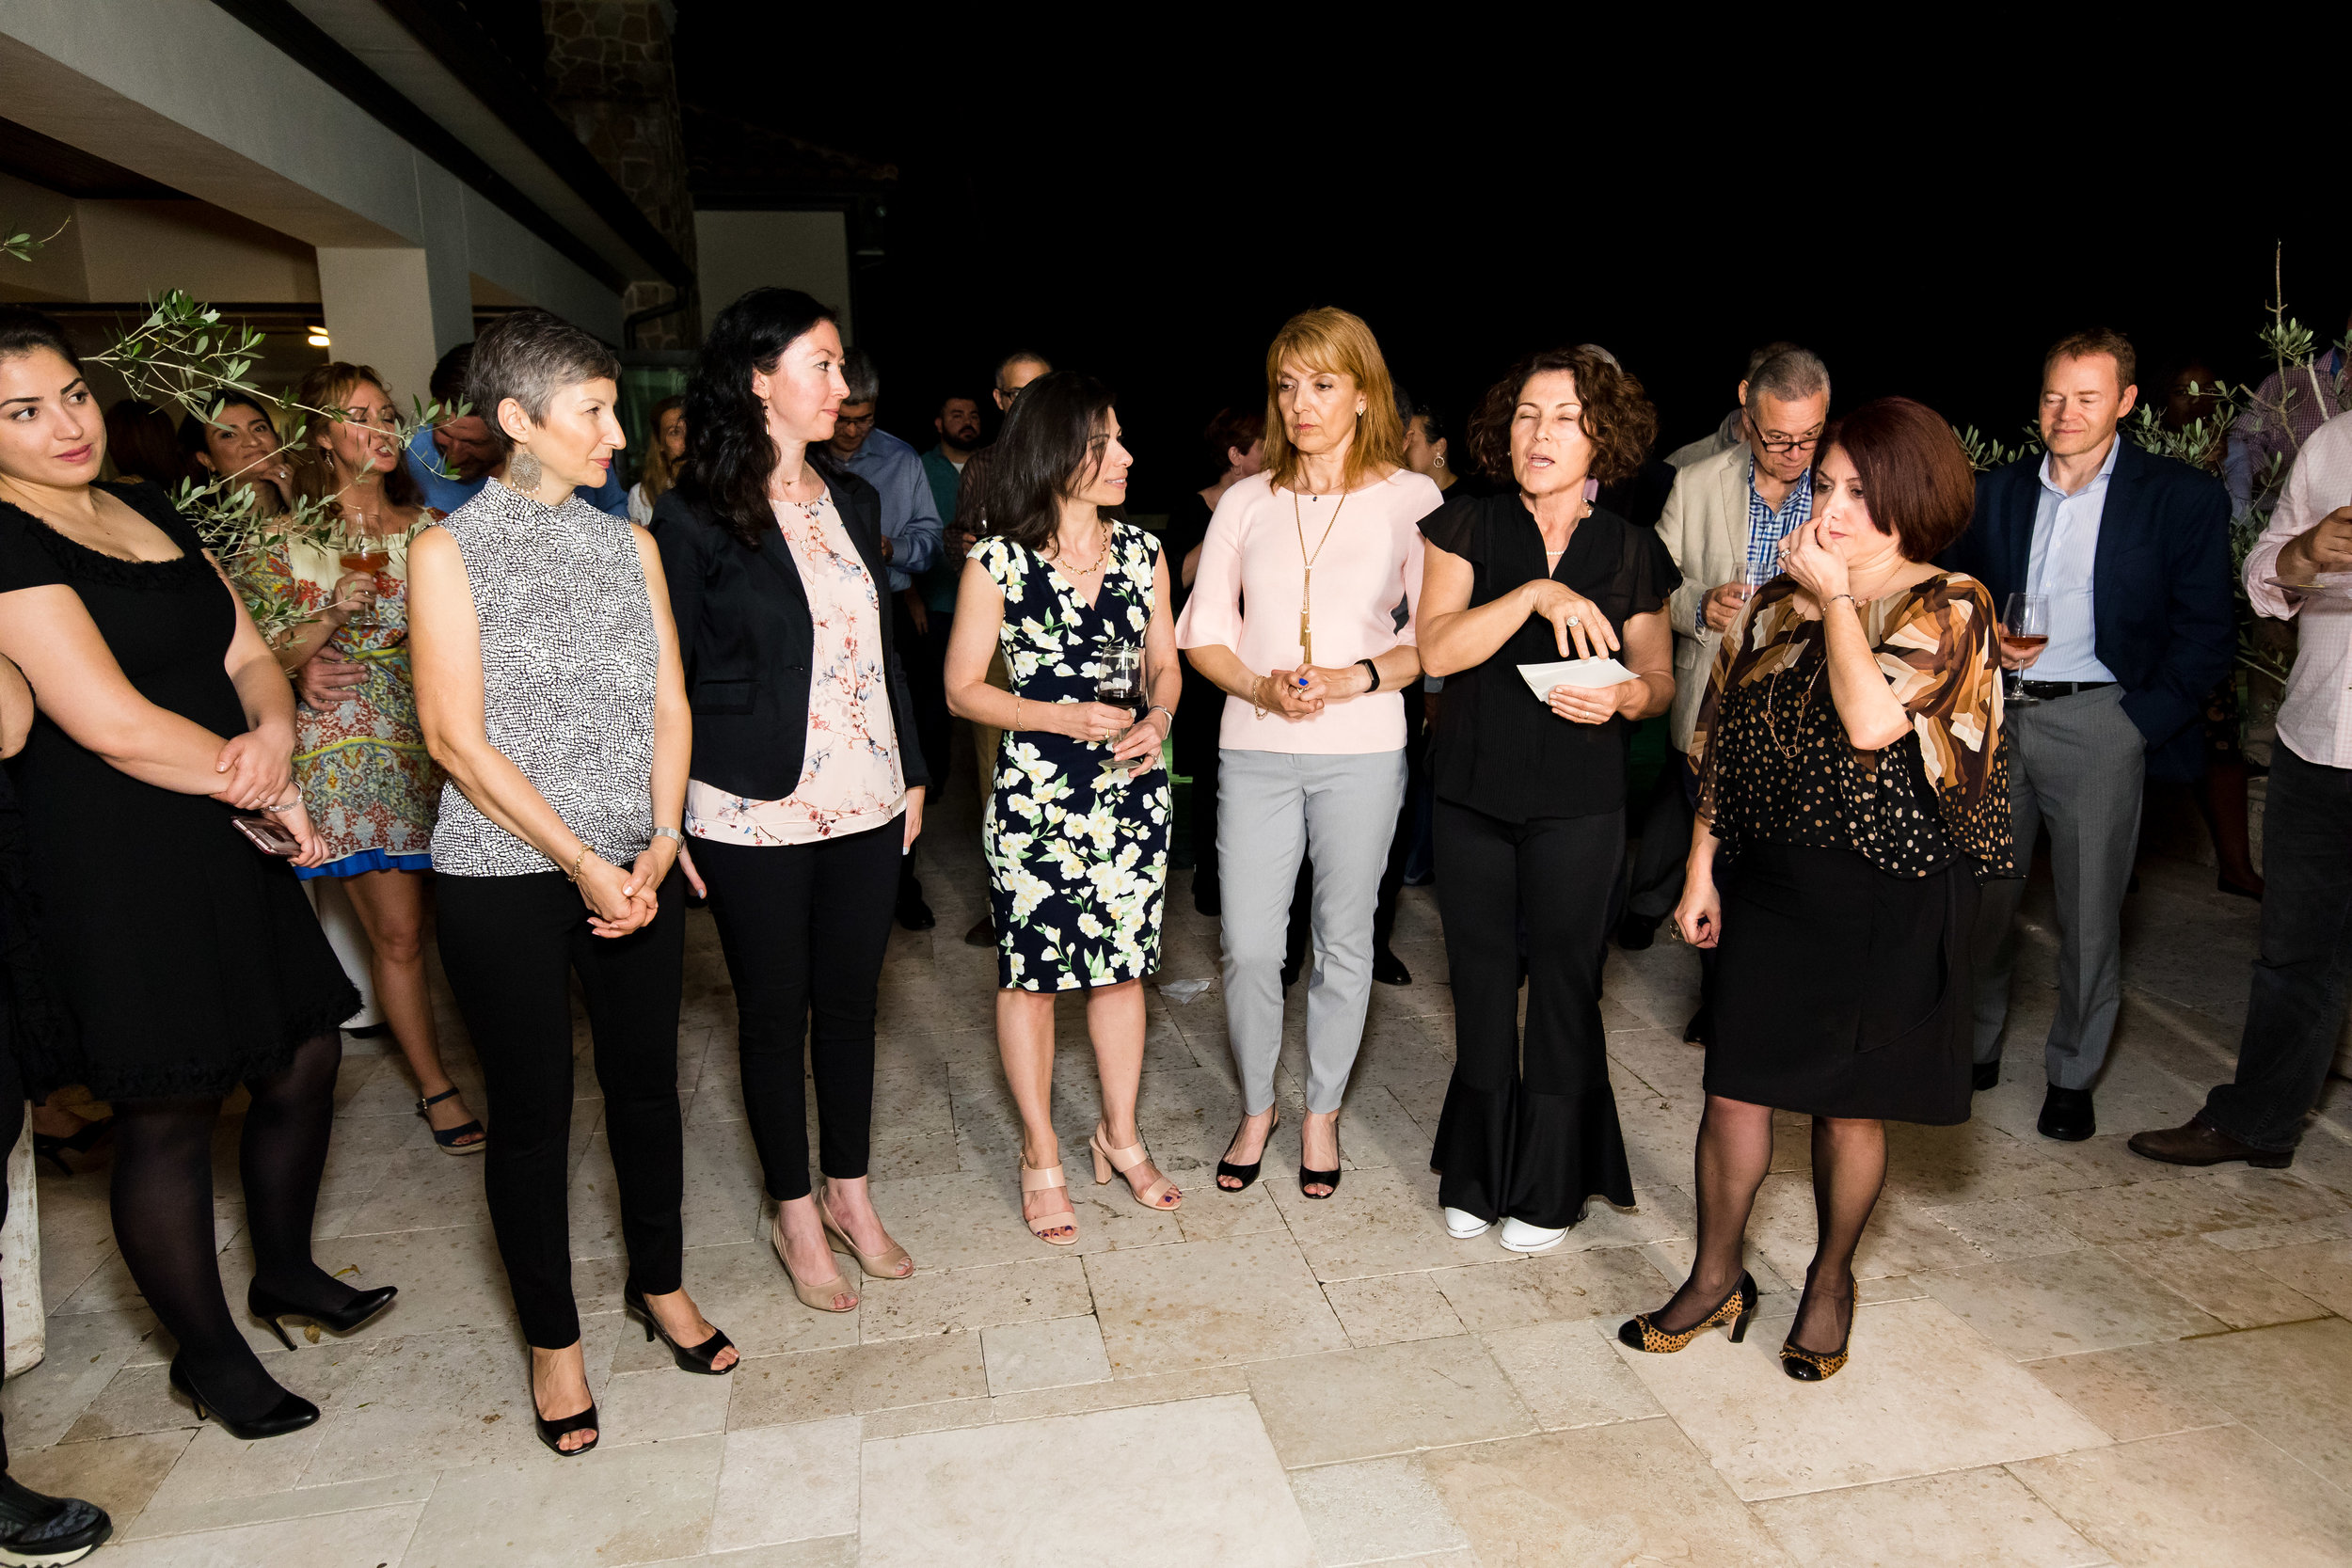 20180421-3rd Annual Education Women Turkey-364.jpg